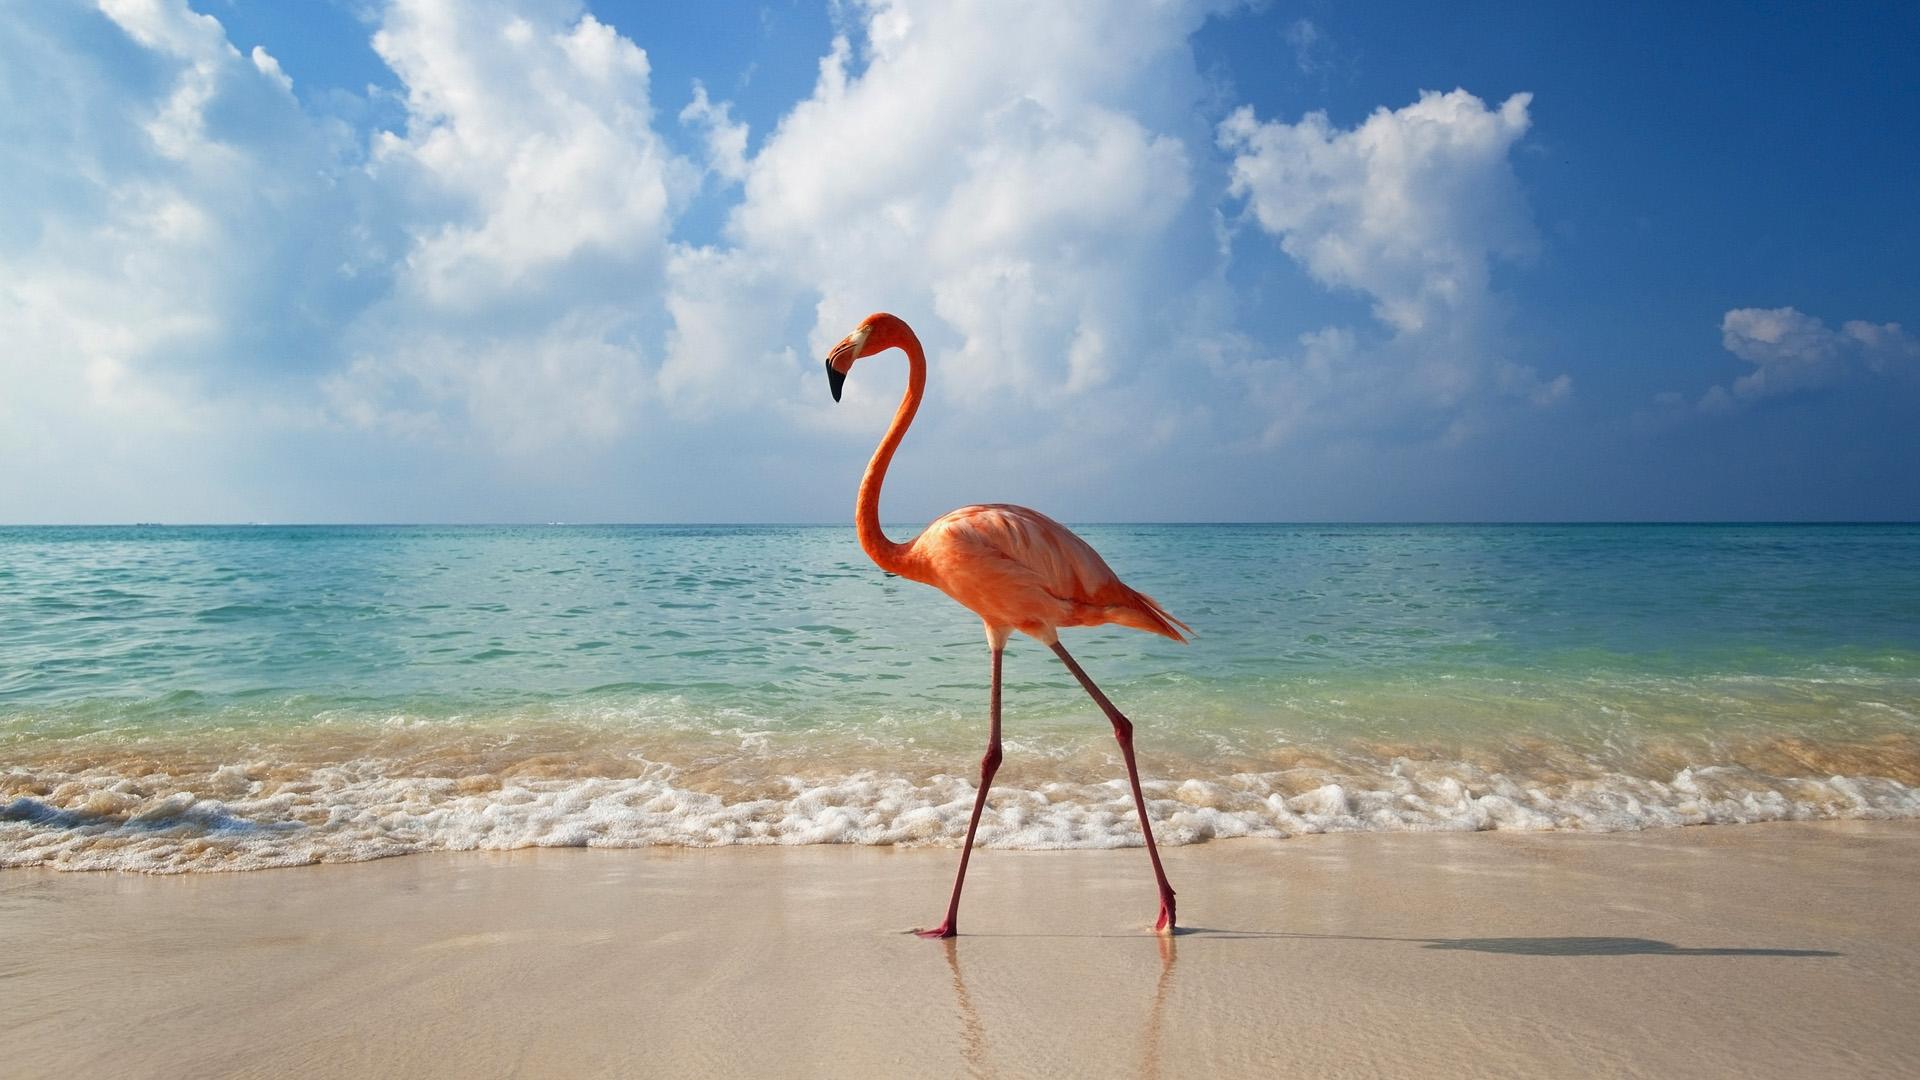 розовый фламинго у воды